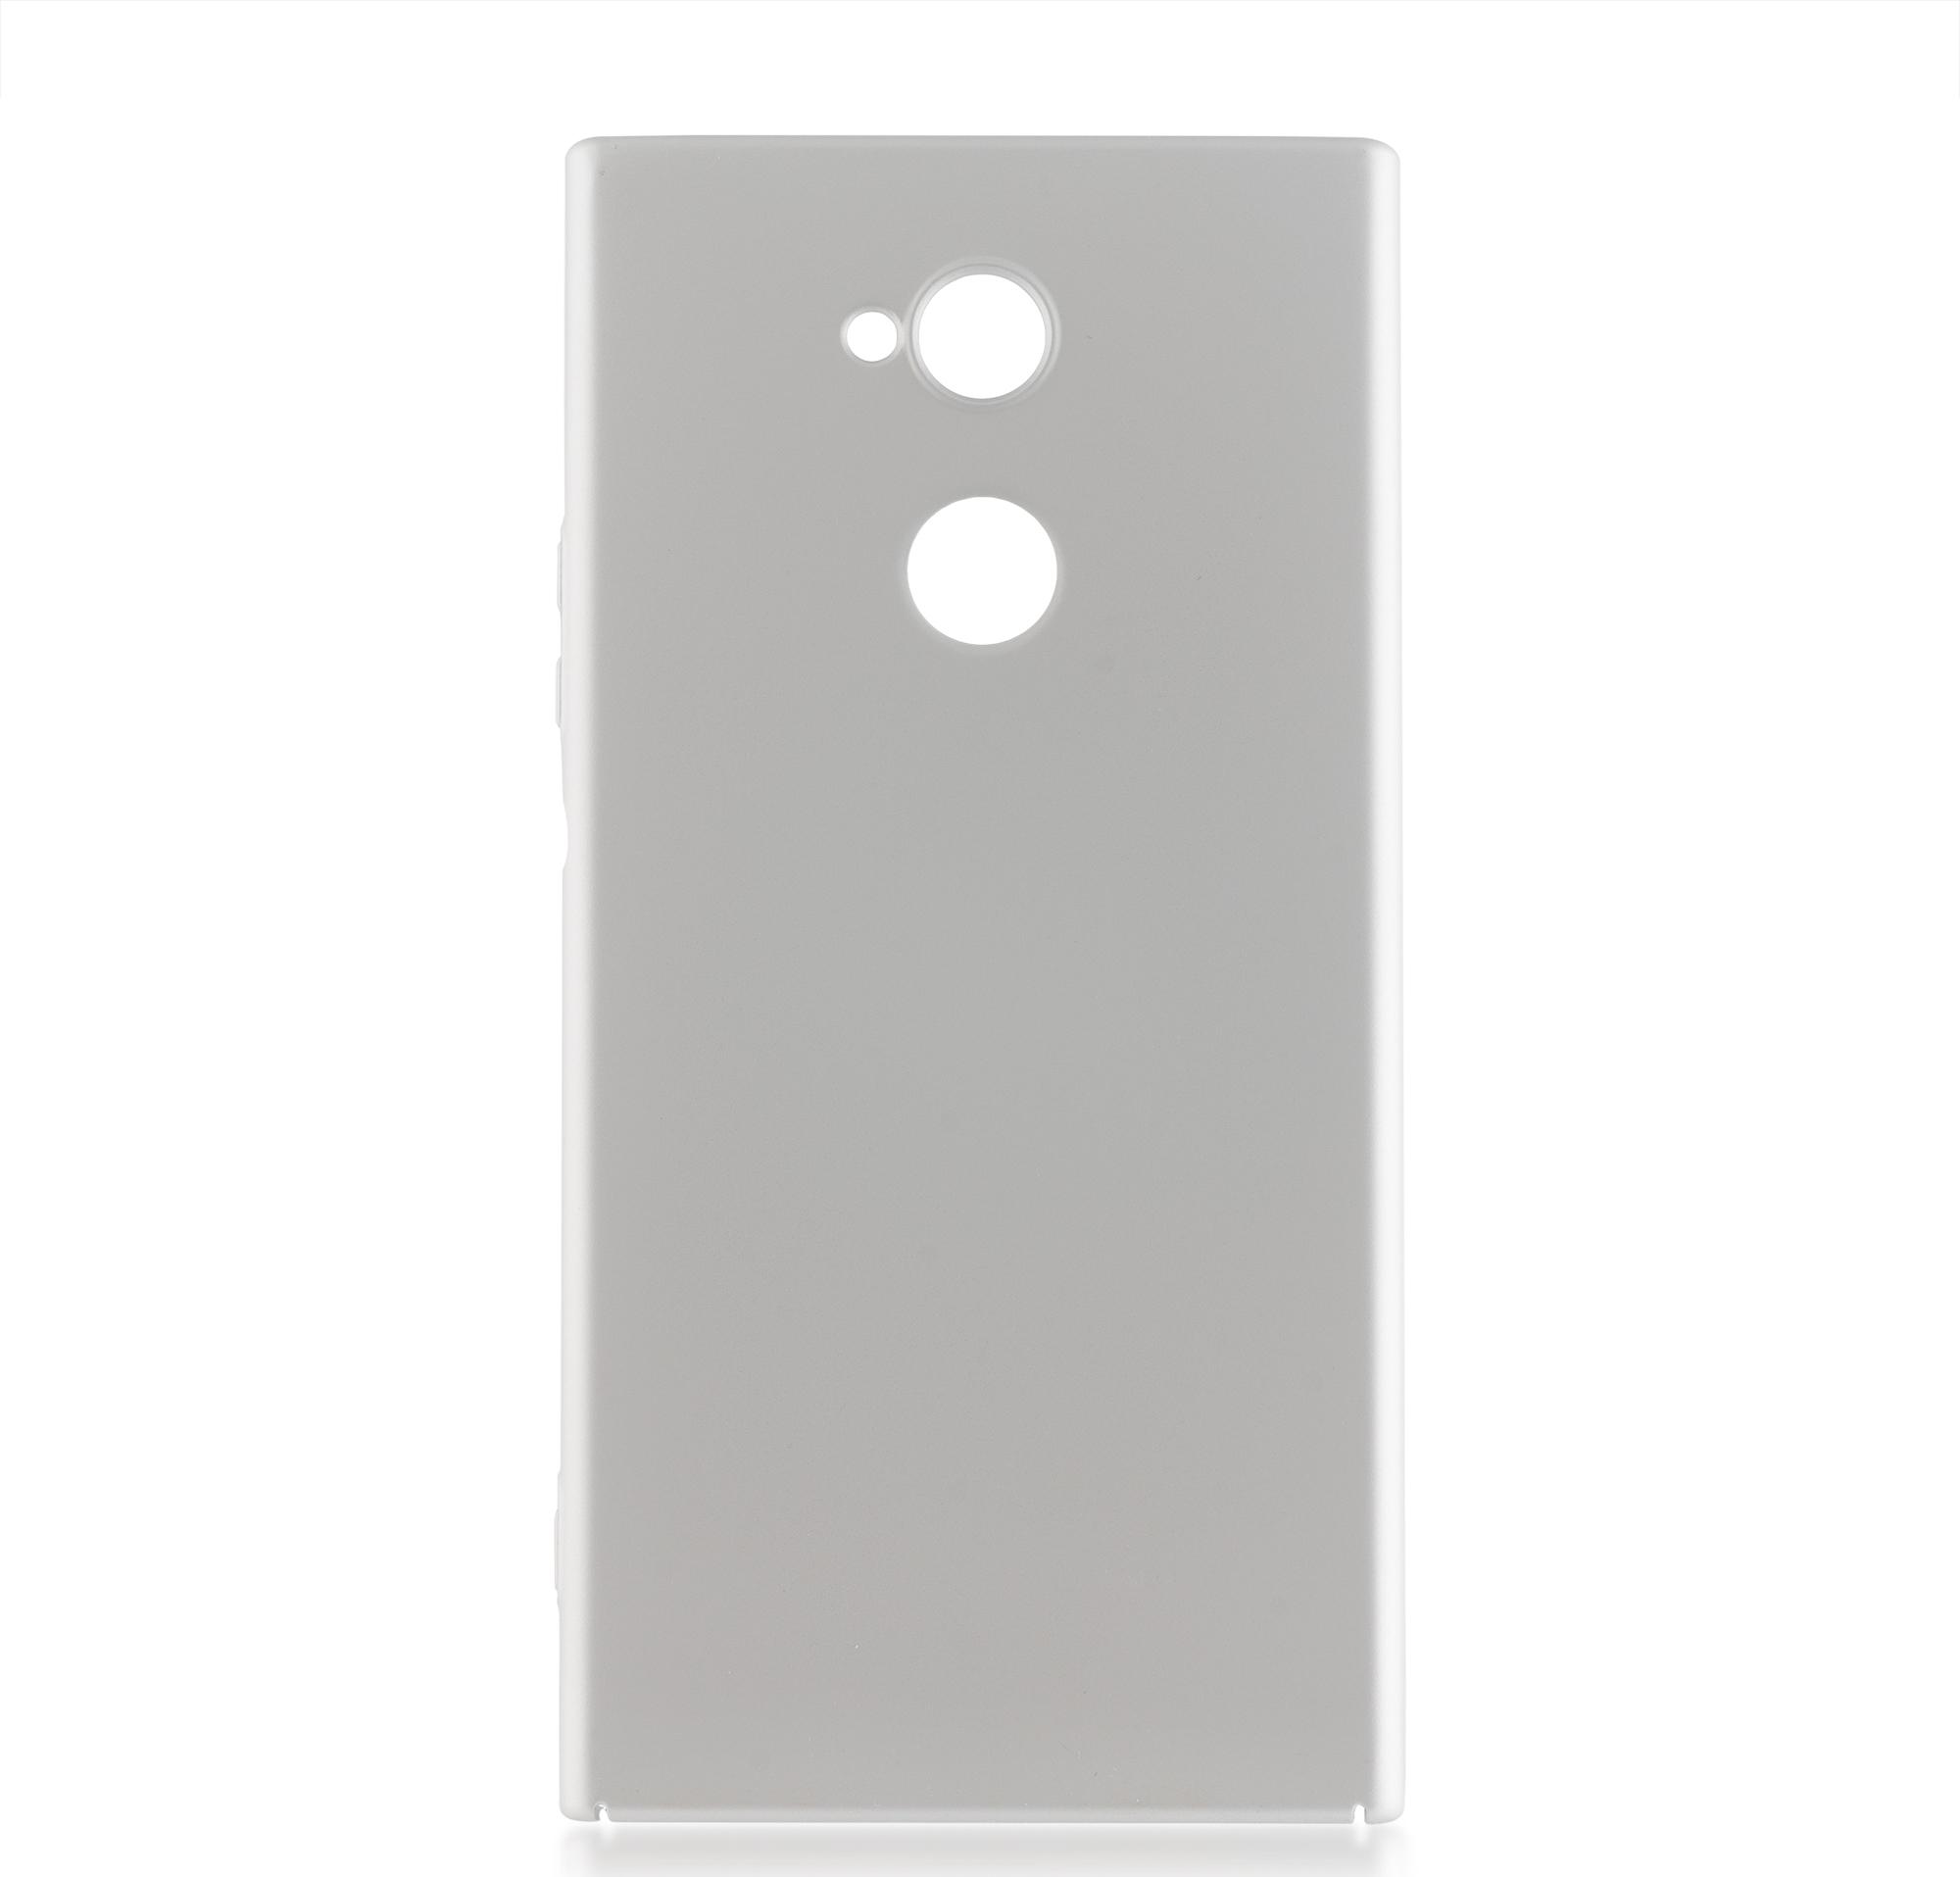 Чехол Brosco 4Side Soft-Touch для Sony Xperia XA2 Ultra, серебристый чехол для sony h4113 xperia xa2 brosco накладка розовый